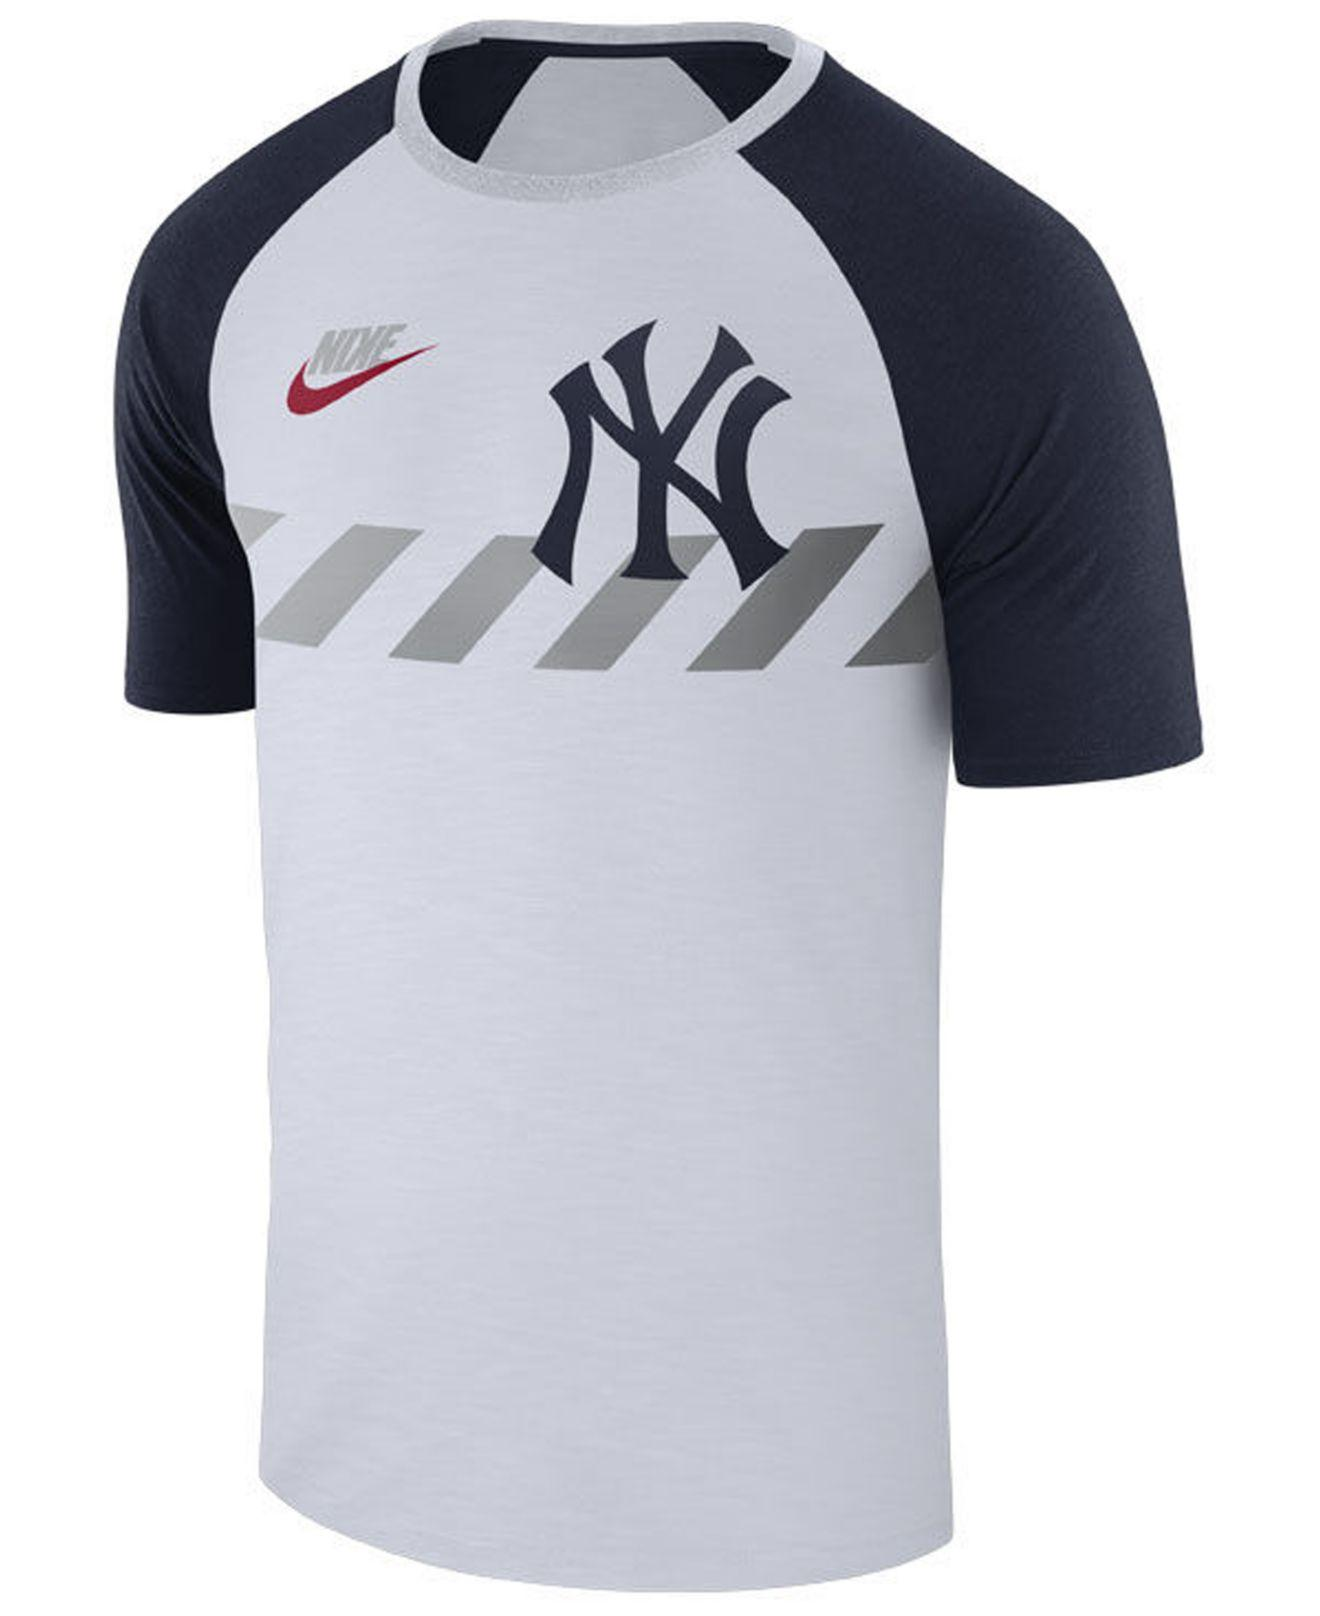 77dd67e11 New York Yankees Tri Blend Raglan T Shirt By Nike - Nils Stucki ...